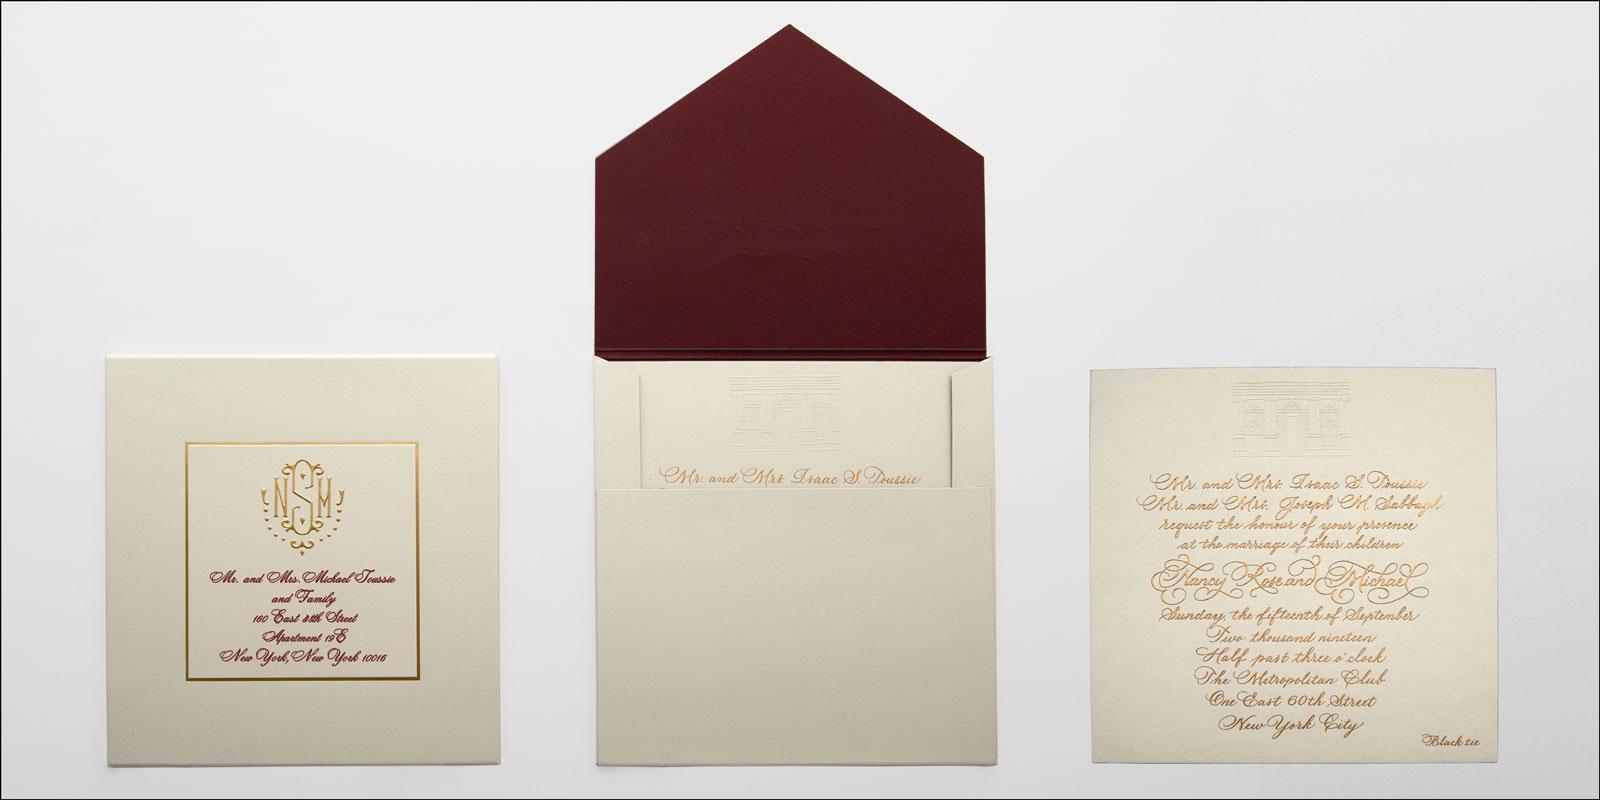 Envelope-and-Invite-in-Envelope